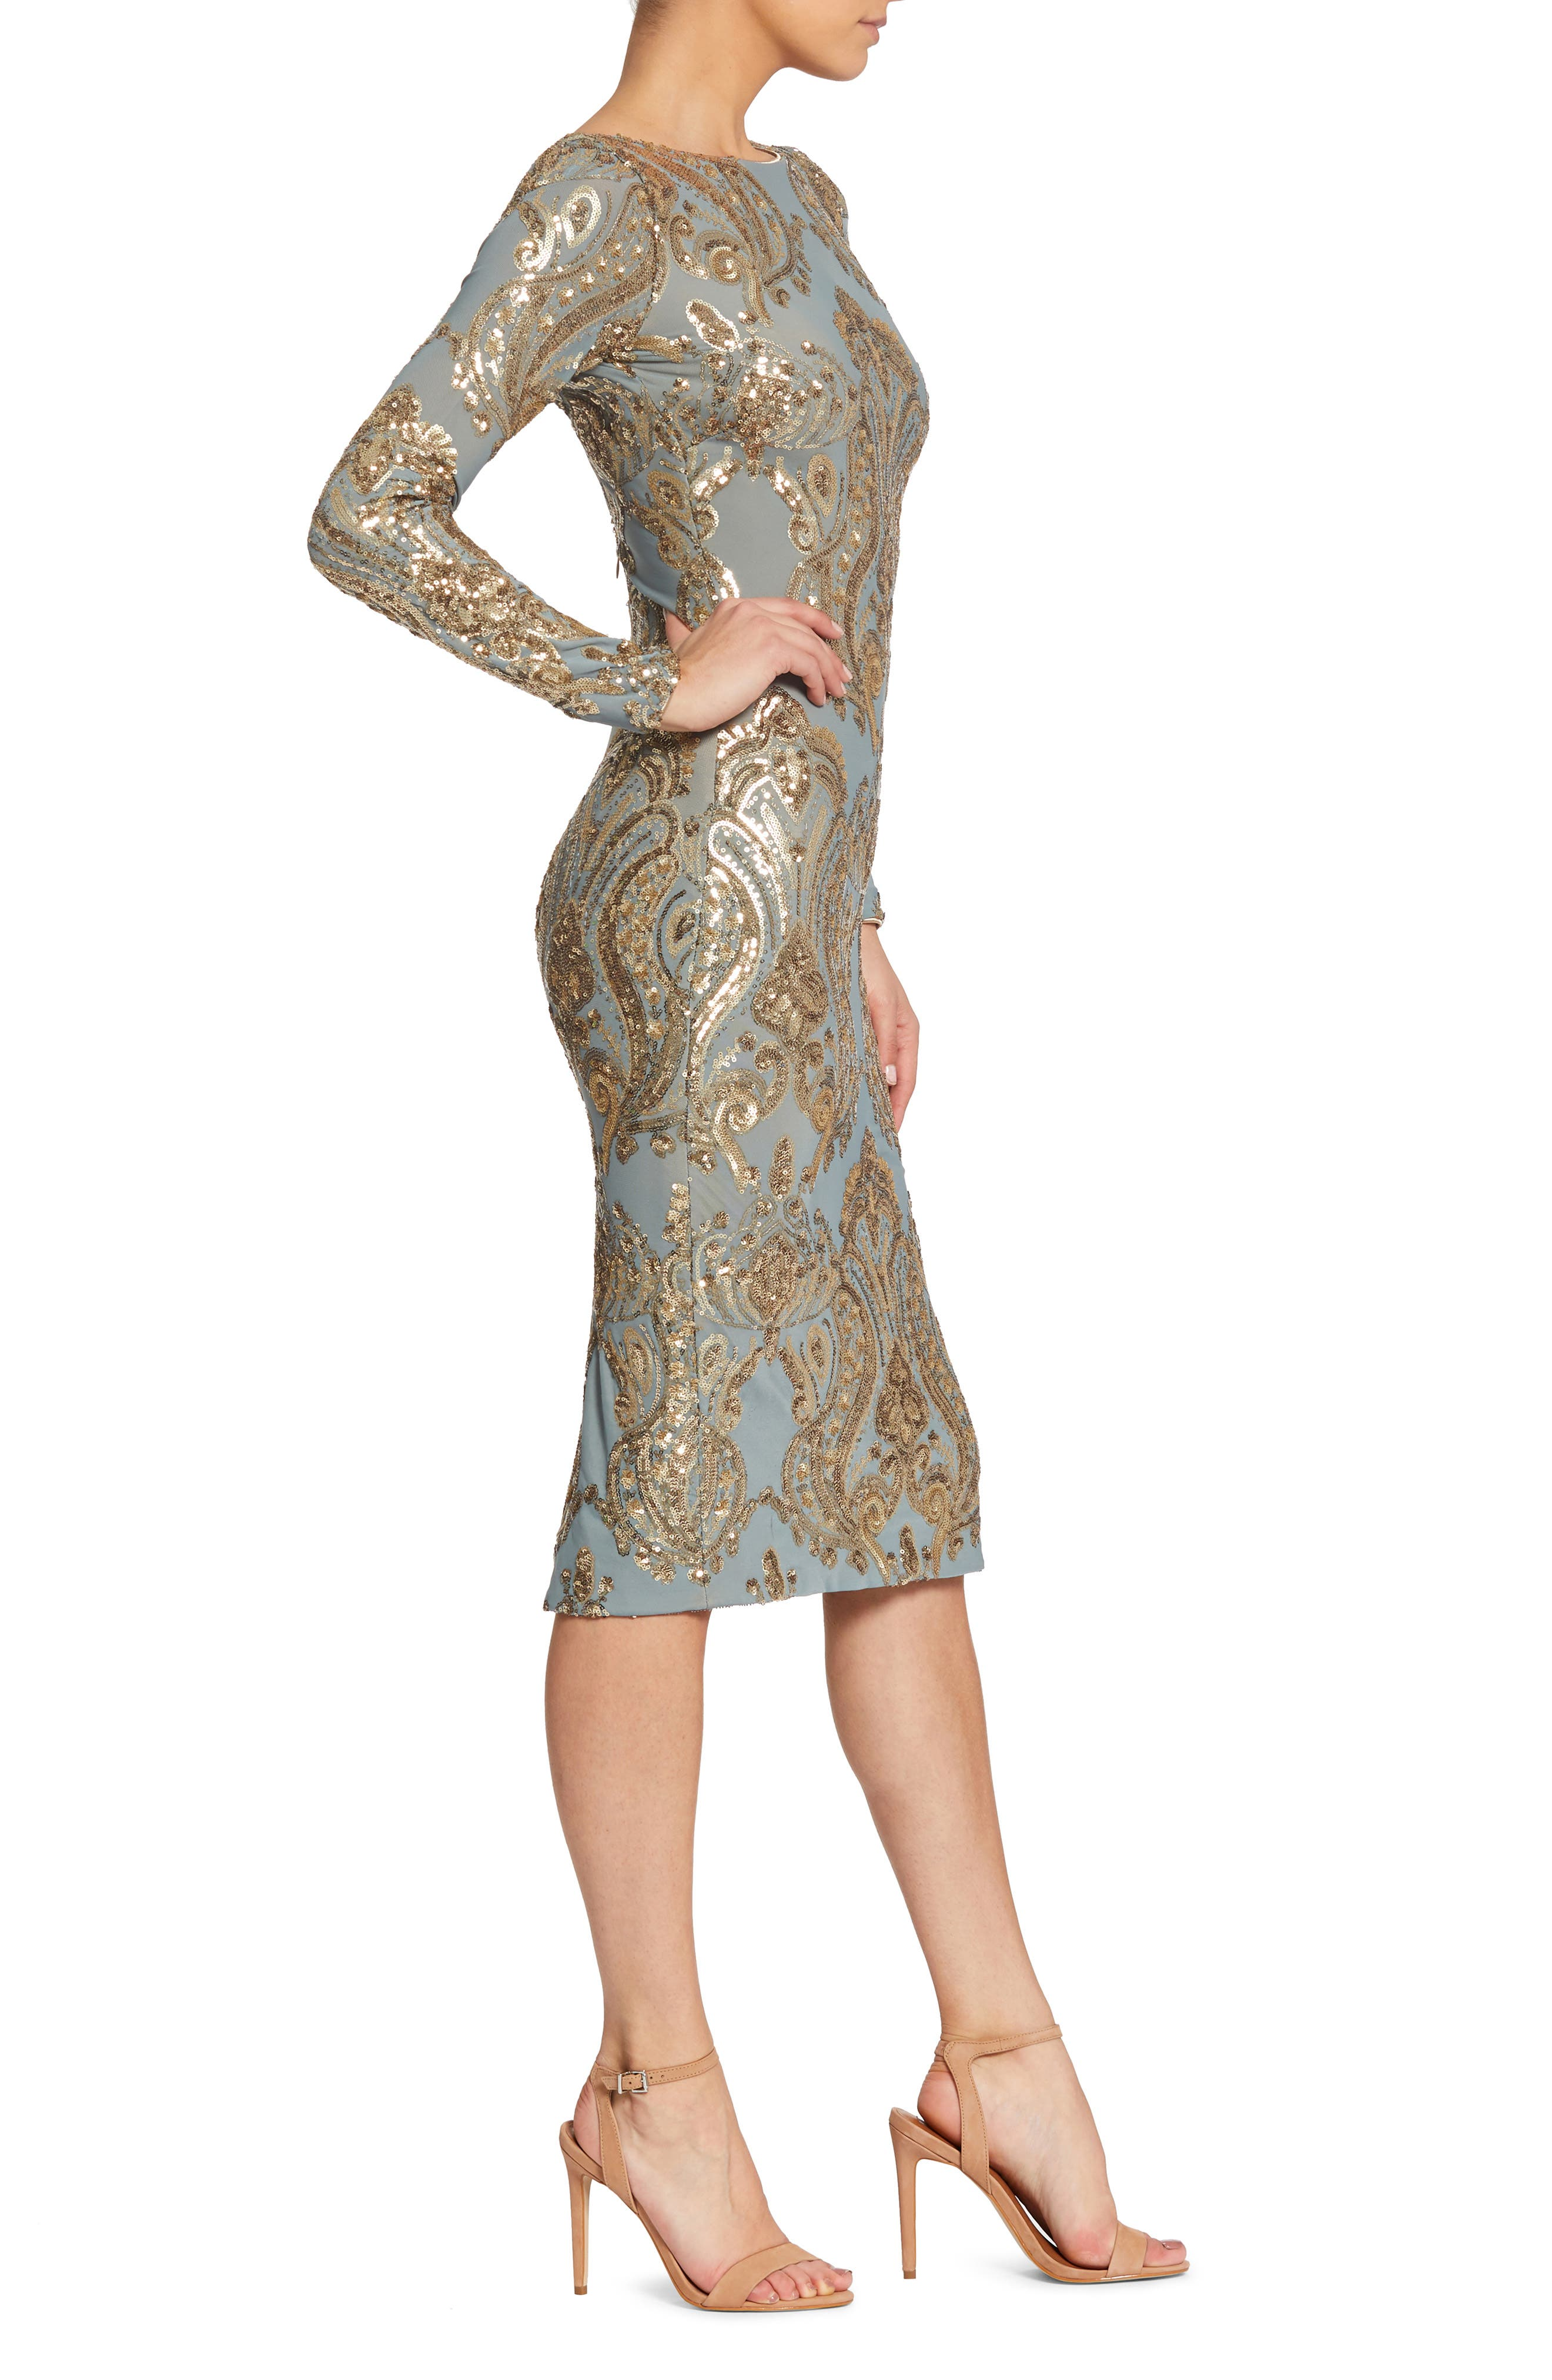 Emery Sequin Sheath Dress,                             Alternate thumbnail 3, color,                             Teal/ Gold